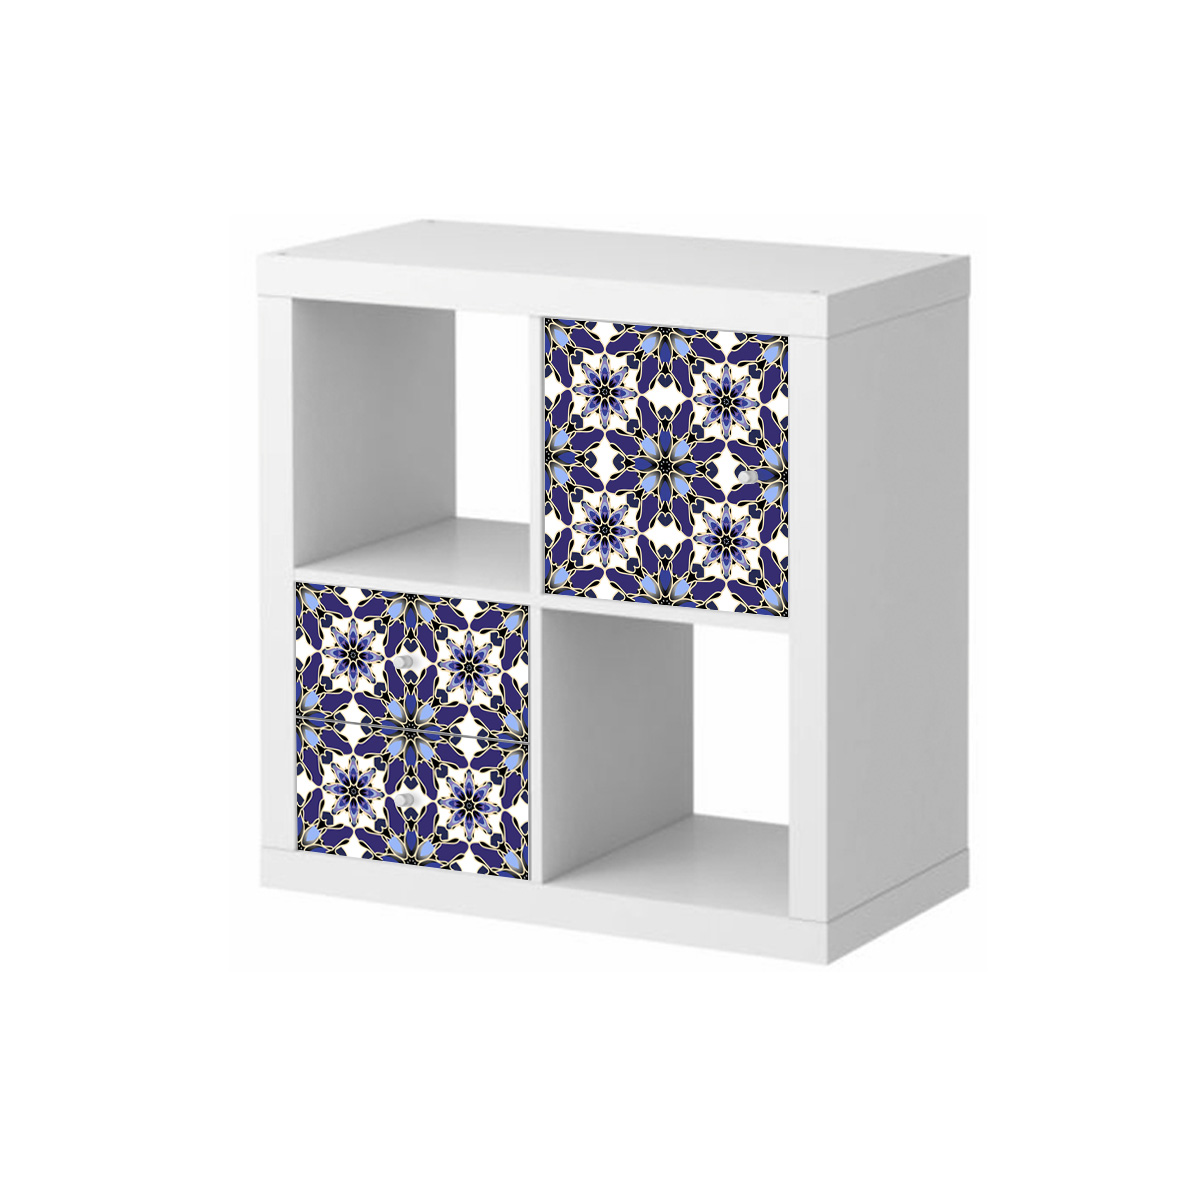 Stickers meubles ikea stickers meubles ikea vitrail en for Nourriture chez ikea